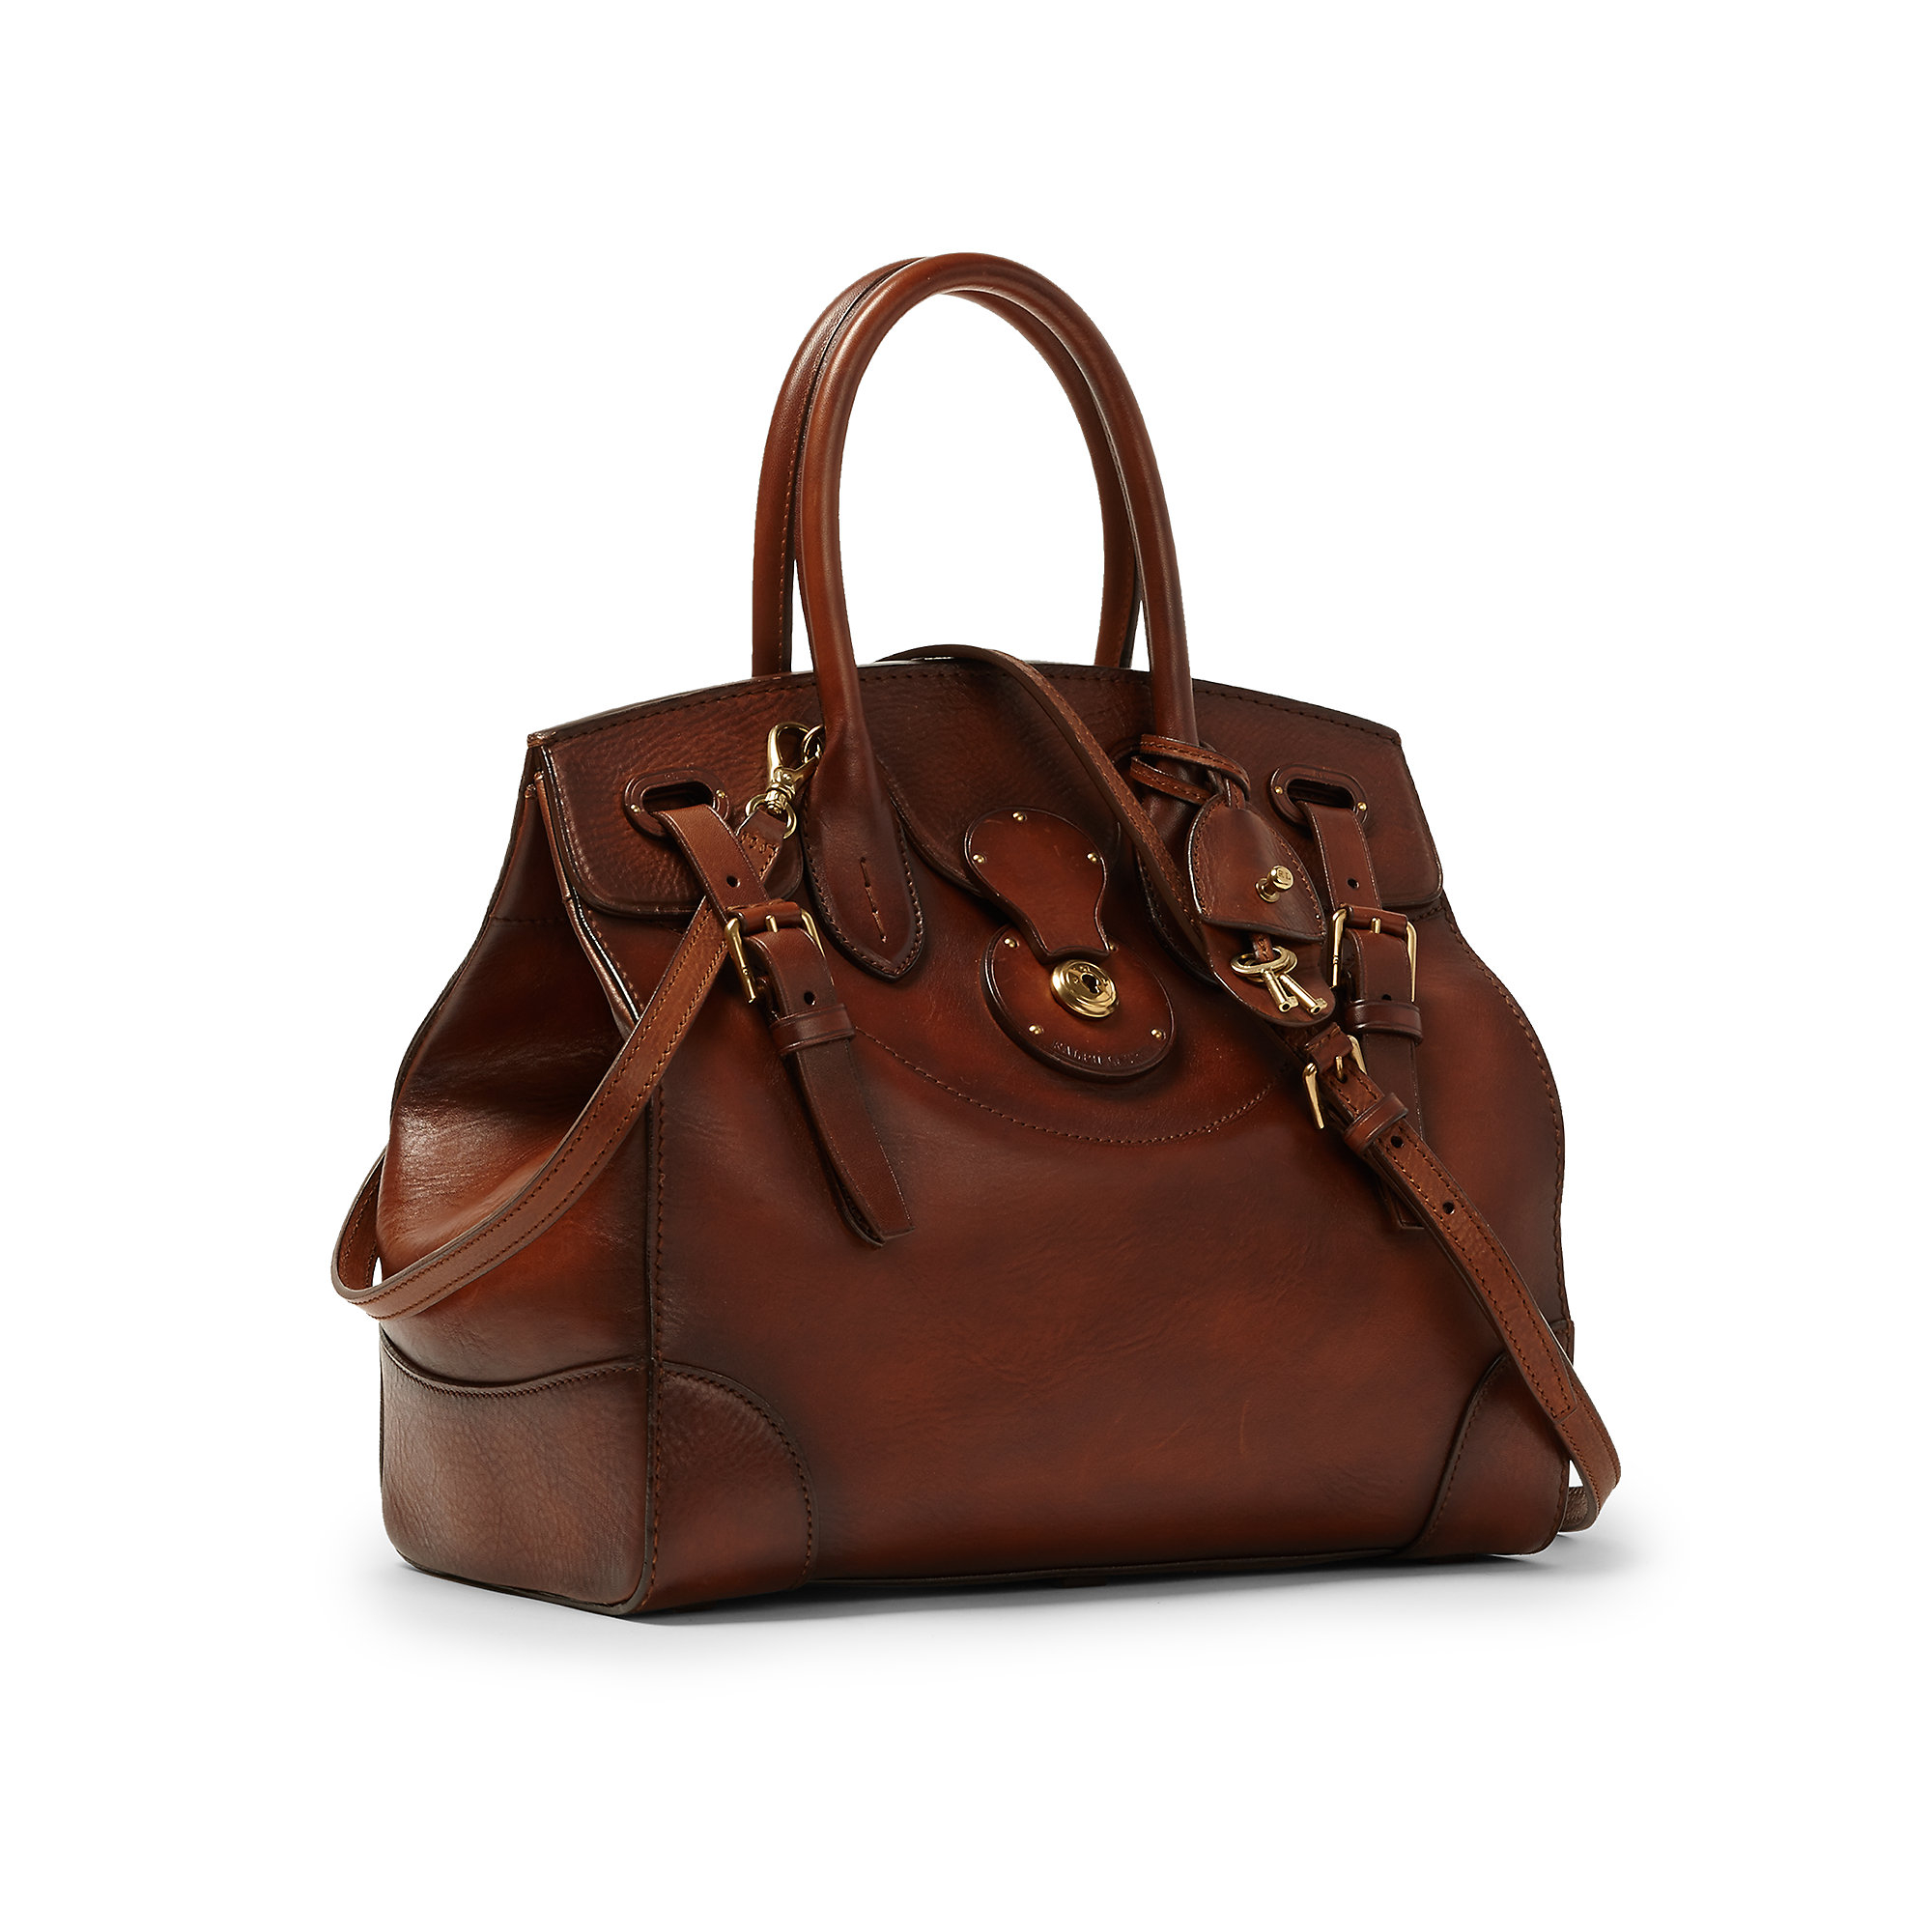 Ralph lauren Medium Soft Ricky Bag in Brown